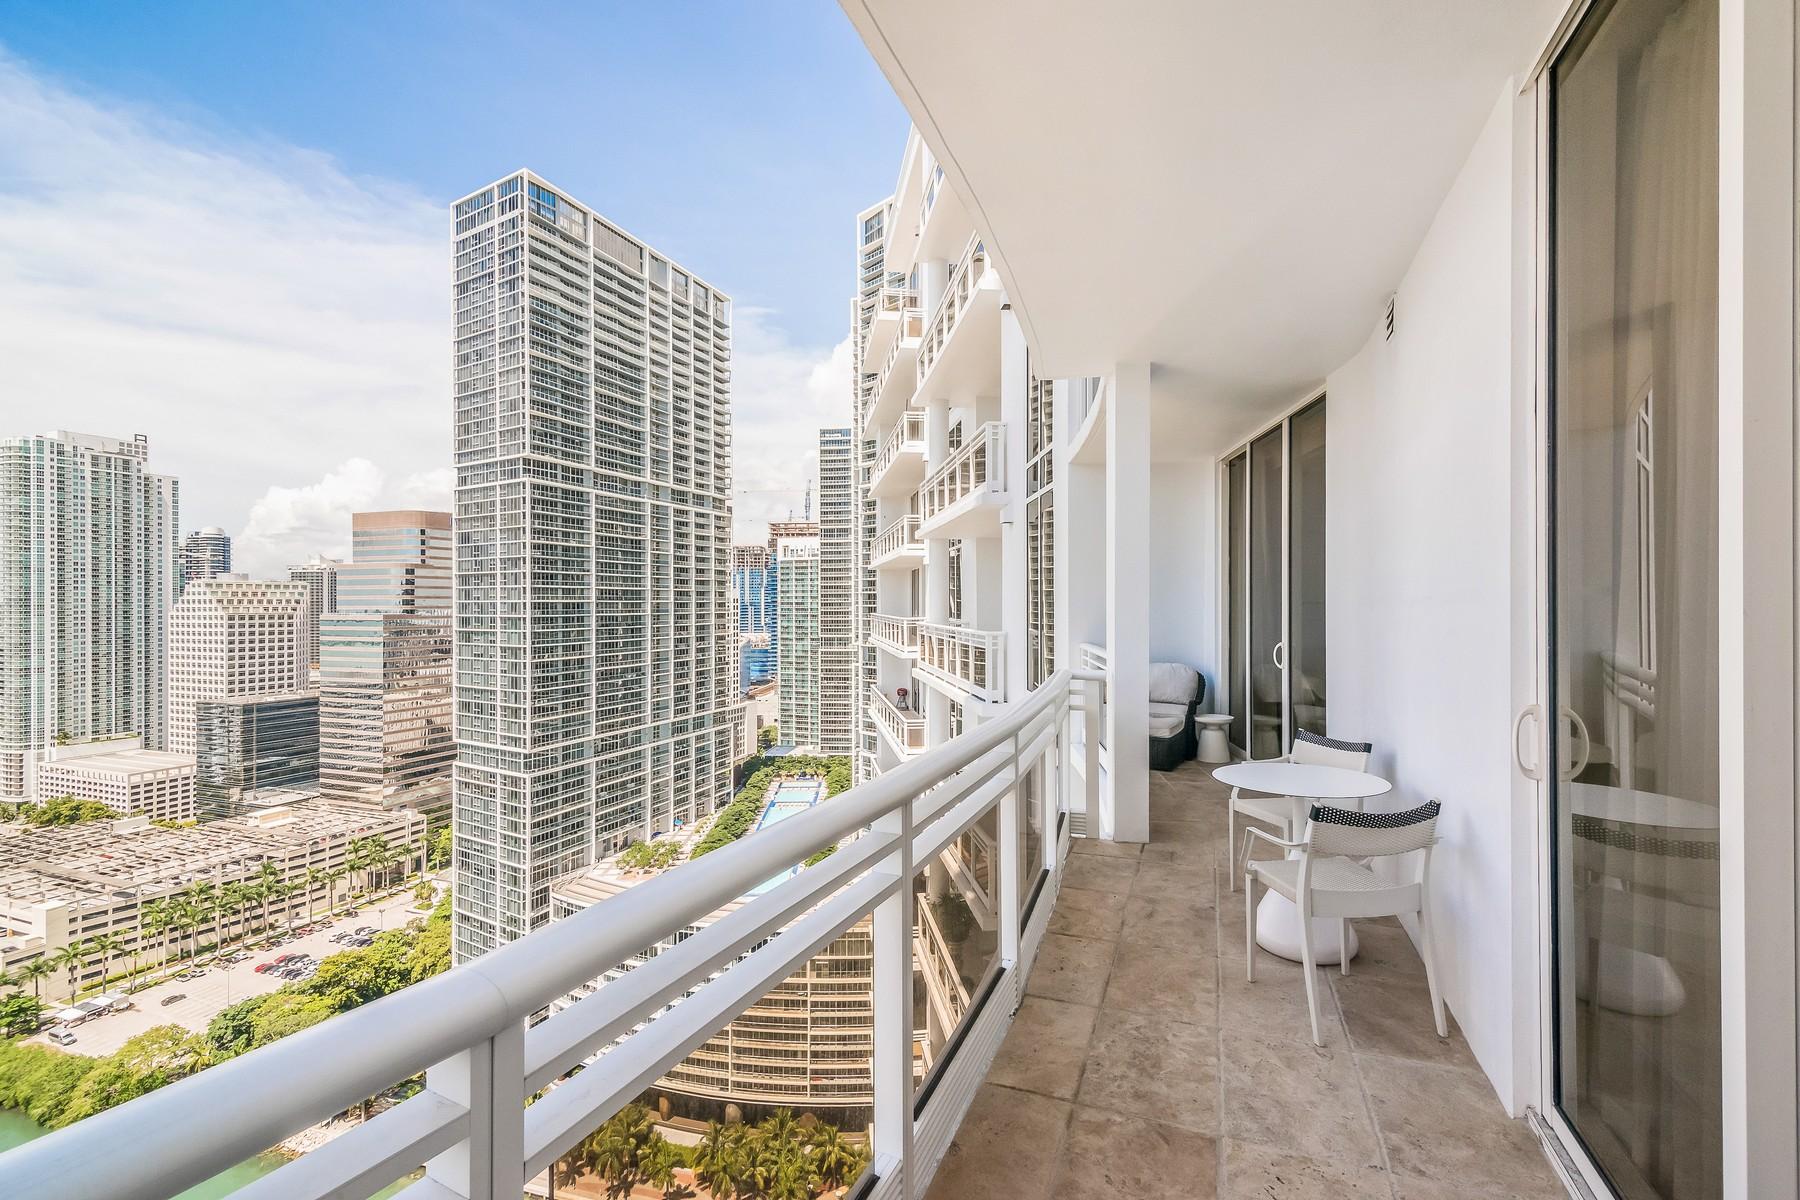 Condominium for Sale at 901 Brickell Key Blvd #3401 901 Brickell Key Blvd, 3401 Miami, Florida 33131 United States